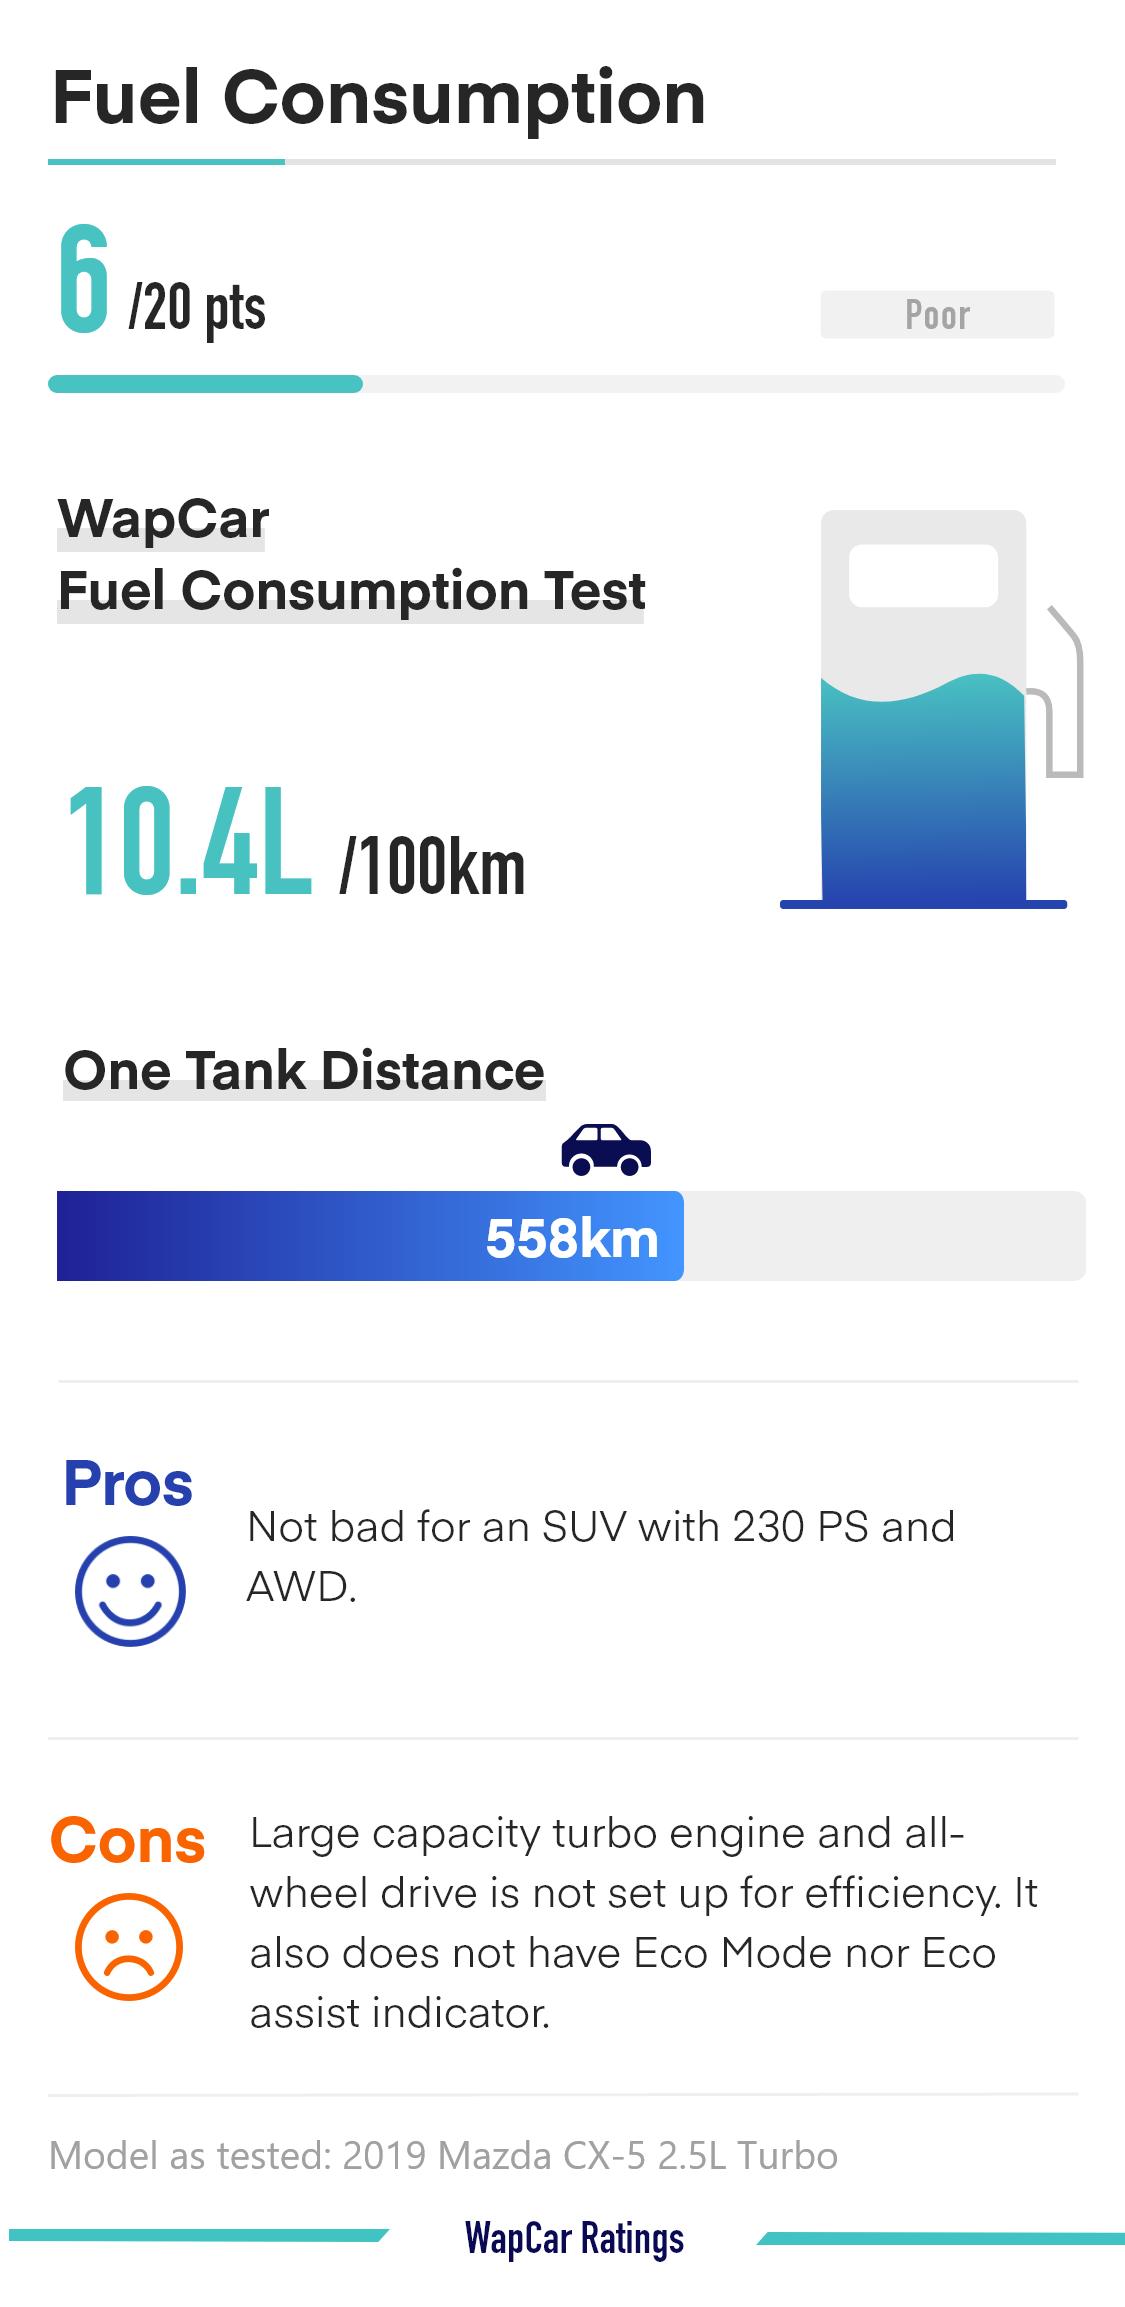 2020 Mazda CX-5 2.5 Turbo Fuel Consumption